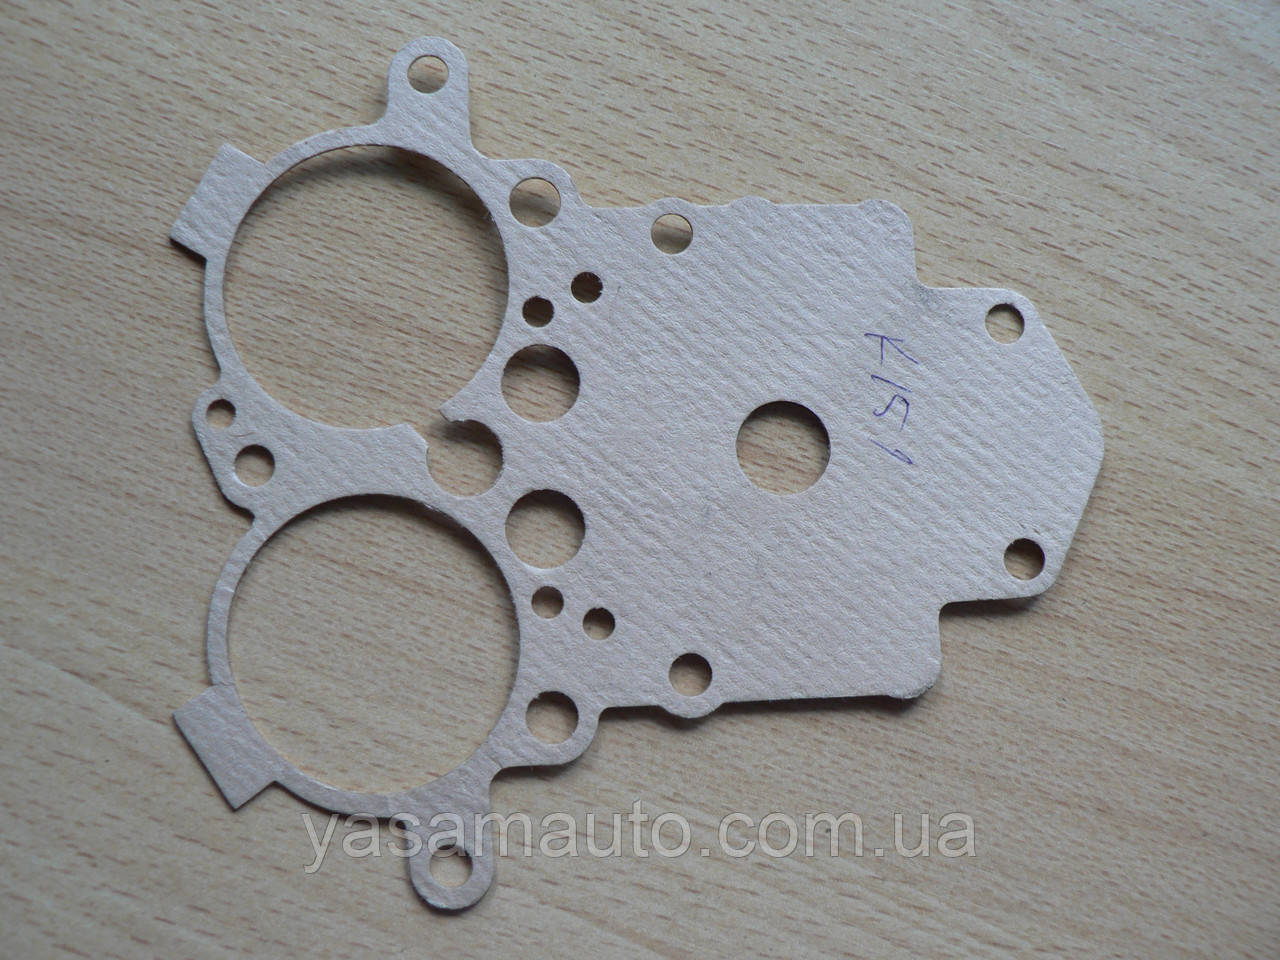 Прокладка карбюратора верхня з картону К151 ГАЗ 2410, газ-3102, 2410 31029 -1107012